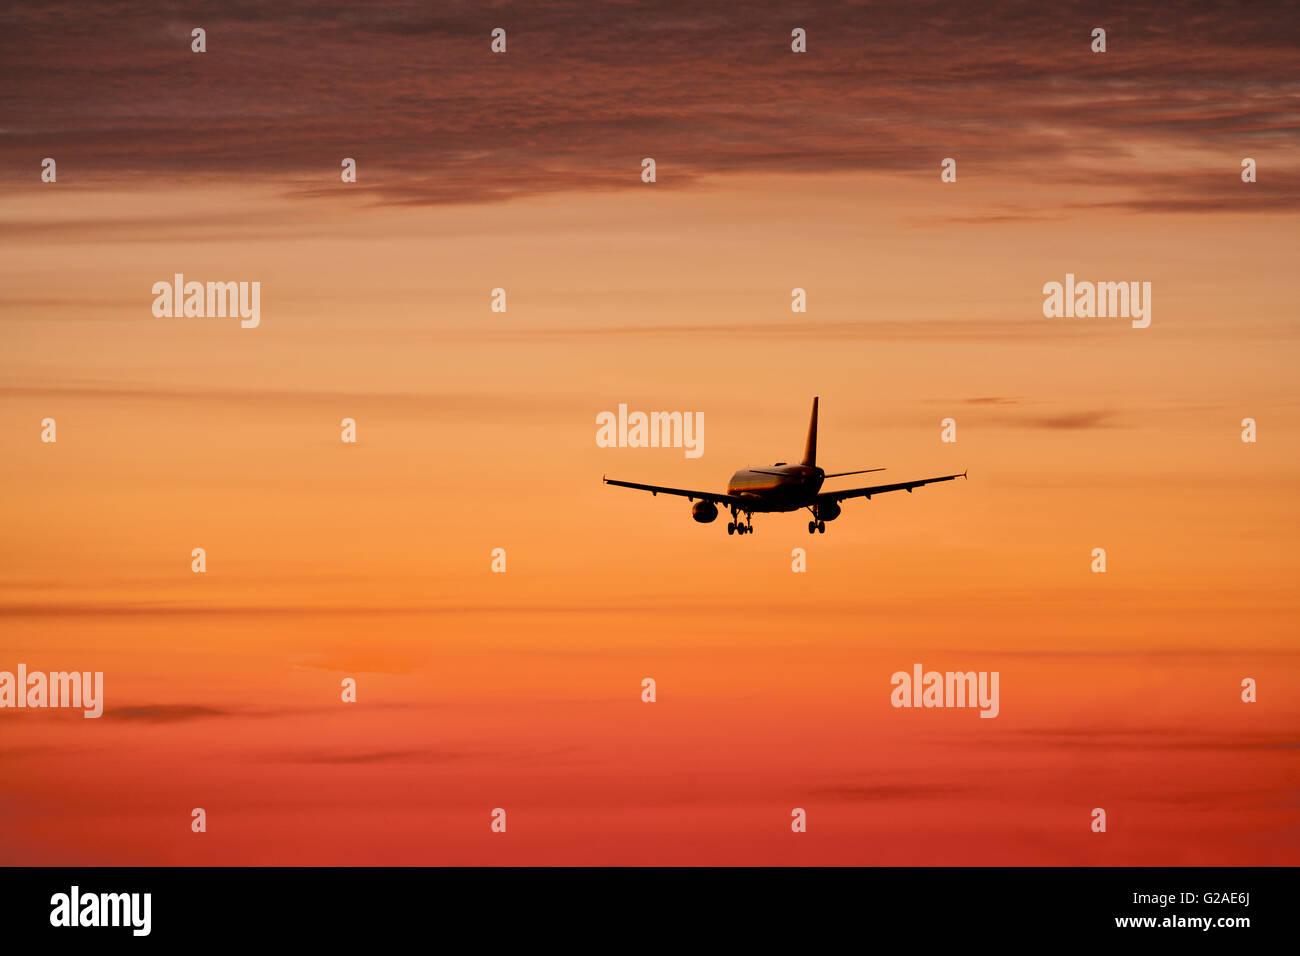 Airplane against orange sky - Stock Image